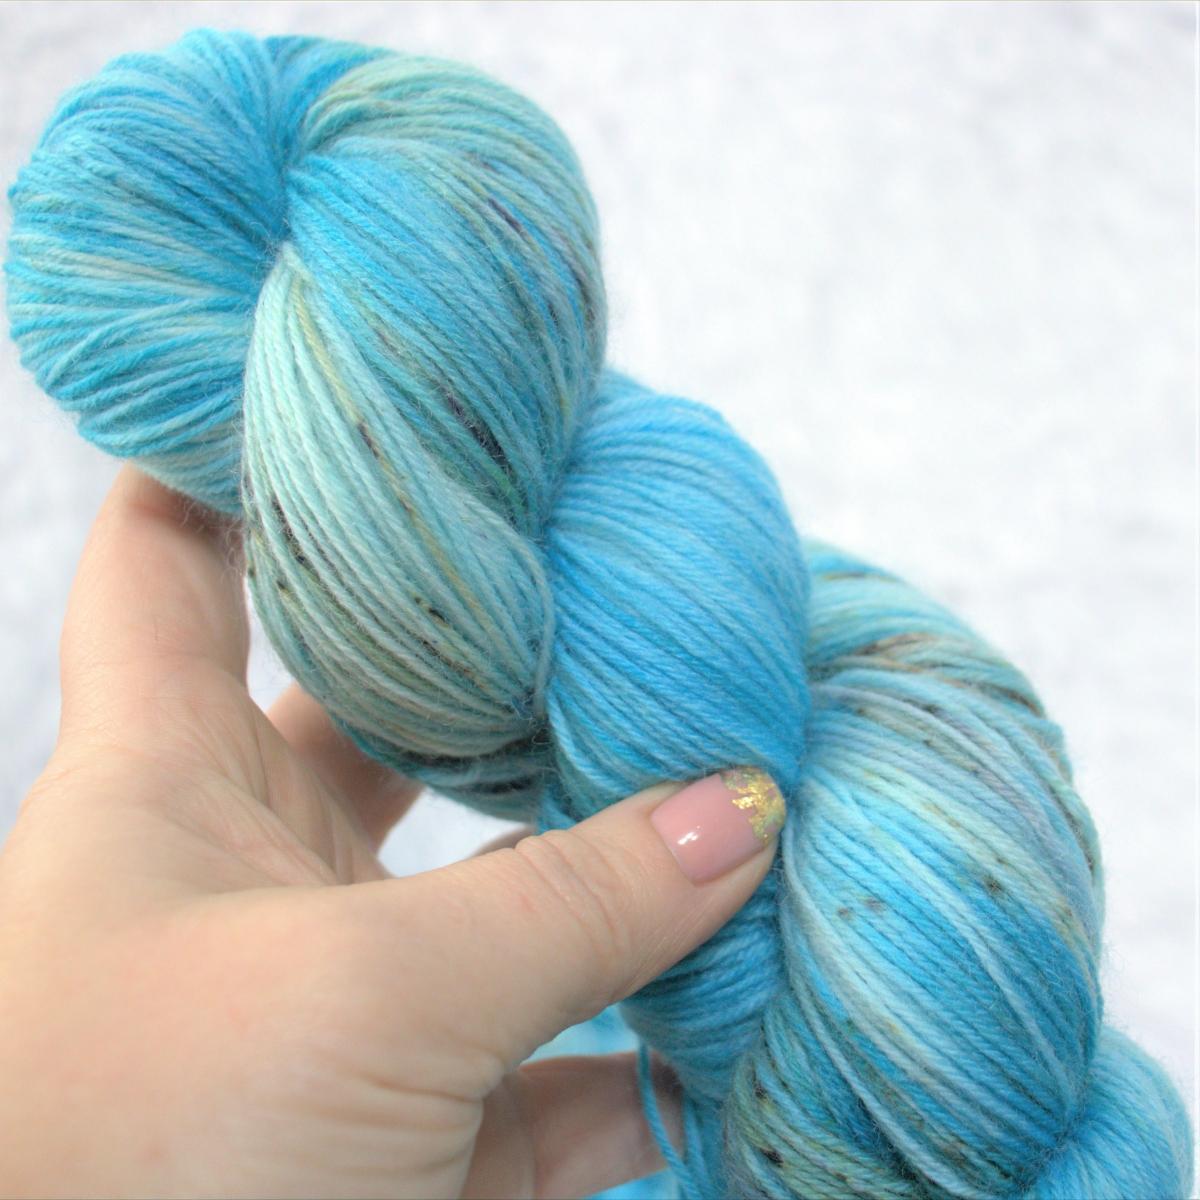 woodico.pro hand dyed yarn 050 3 1200x1200 - Hand dyed yarn / 050